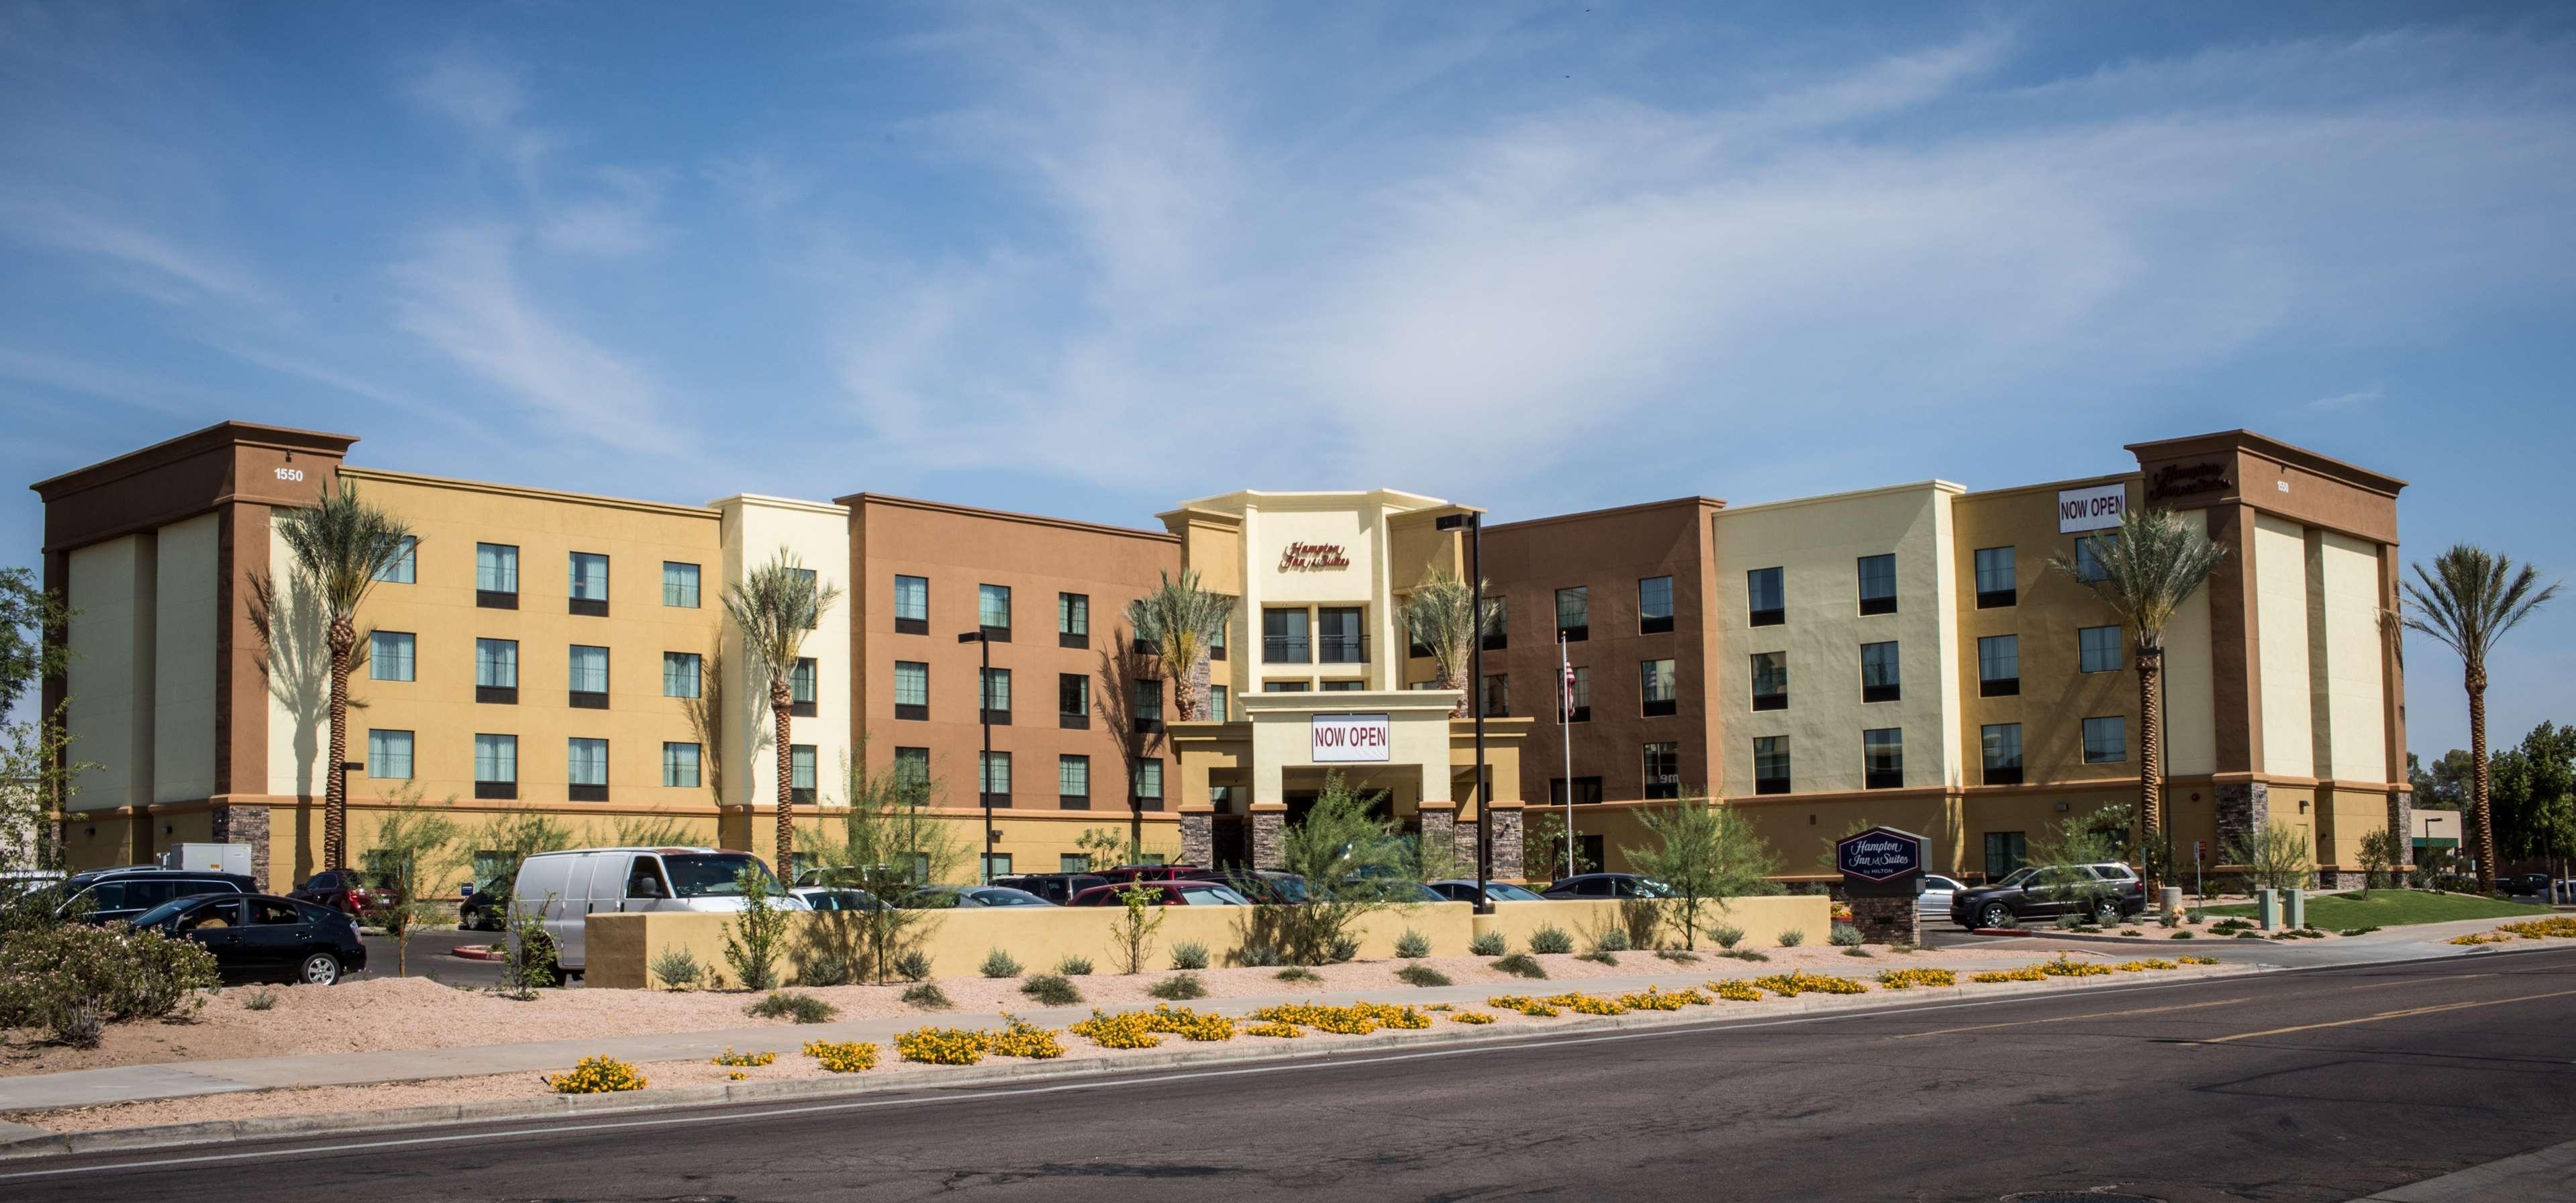 Hampton Inn & Suites Tempe - Phoenix Airport image 0